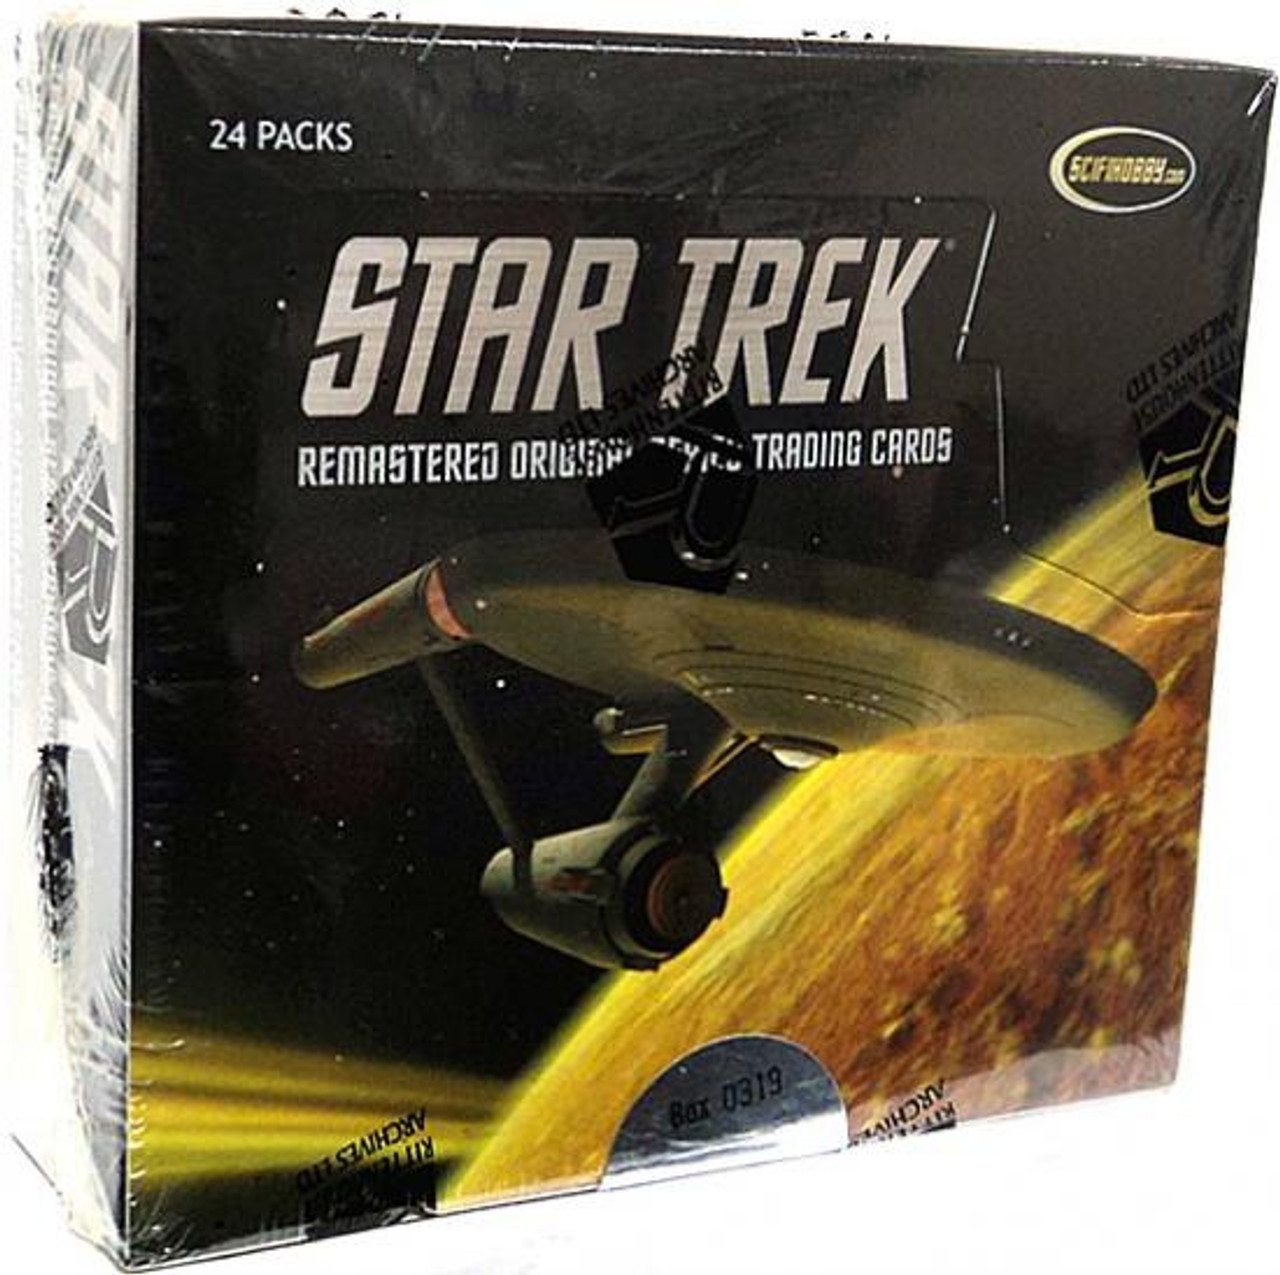 Star Trek The Original Series Remastered Original Series Trading Card Box